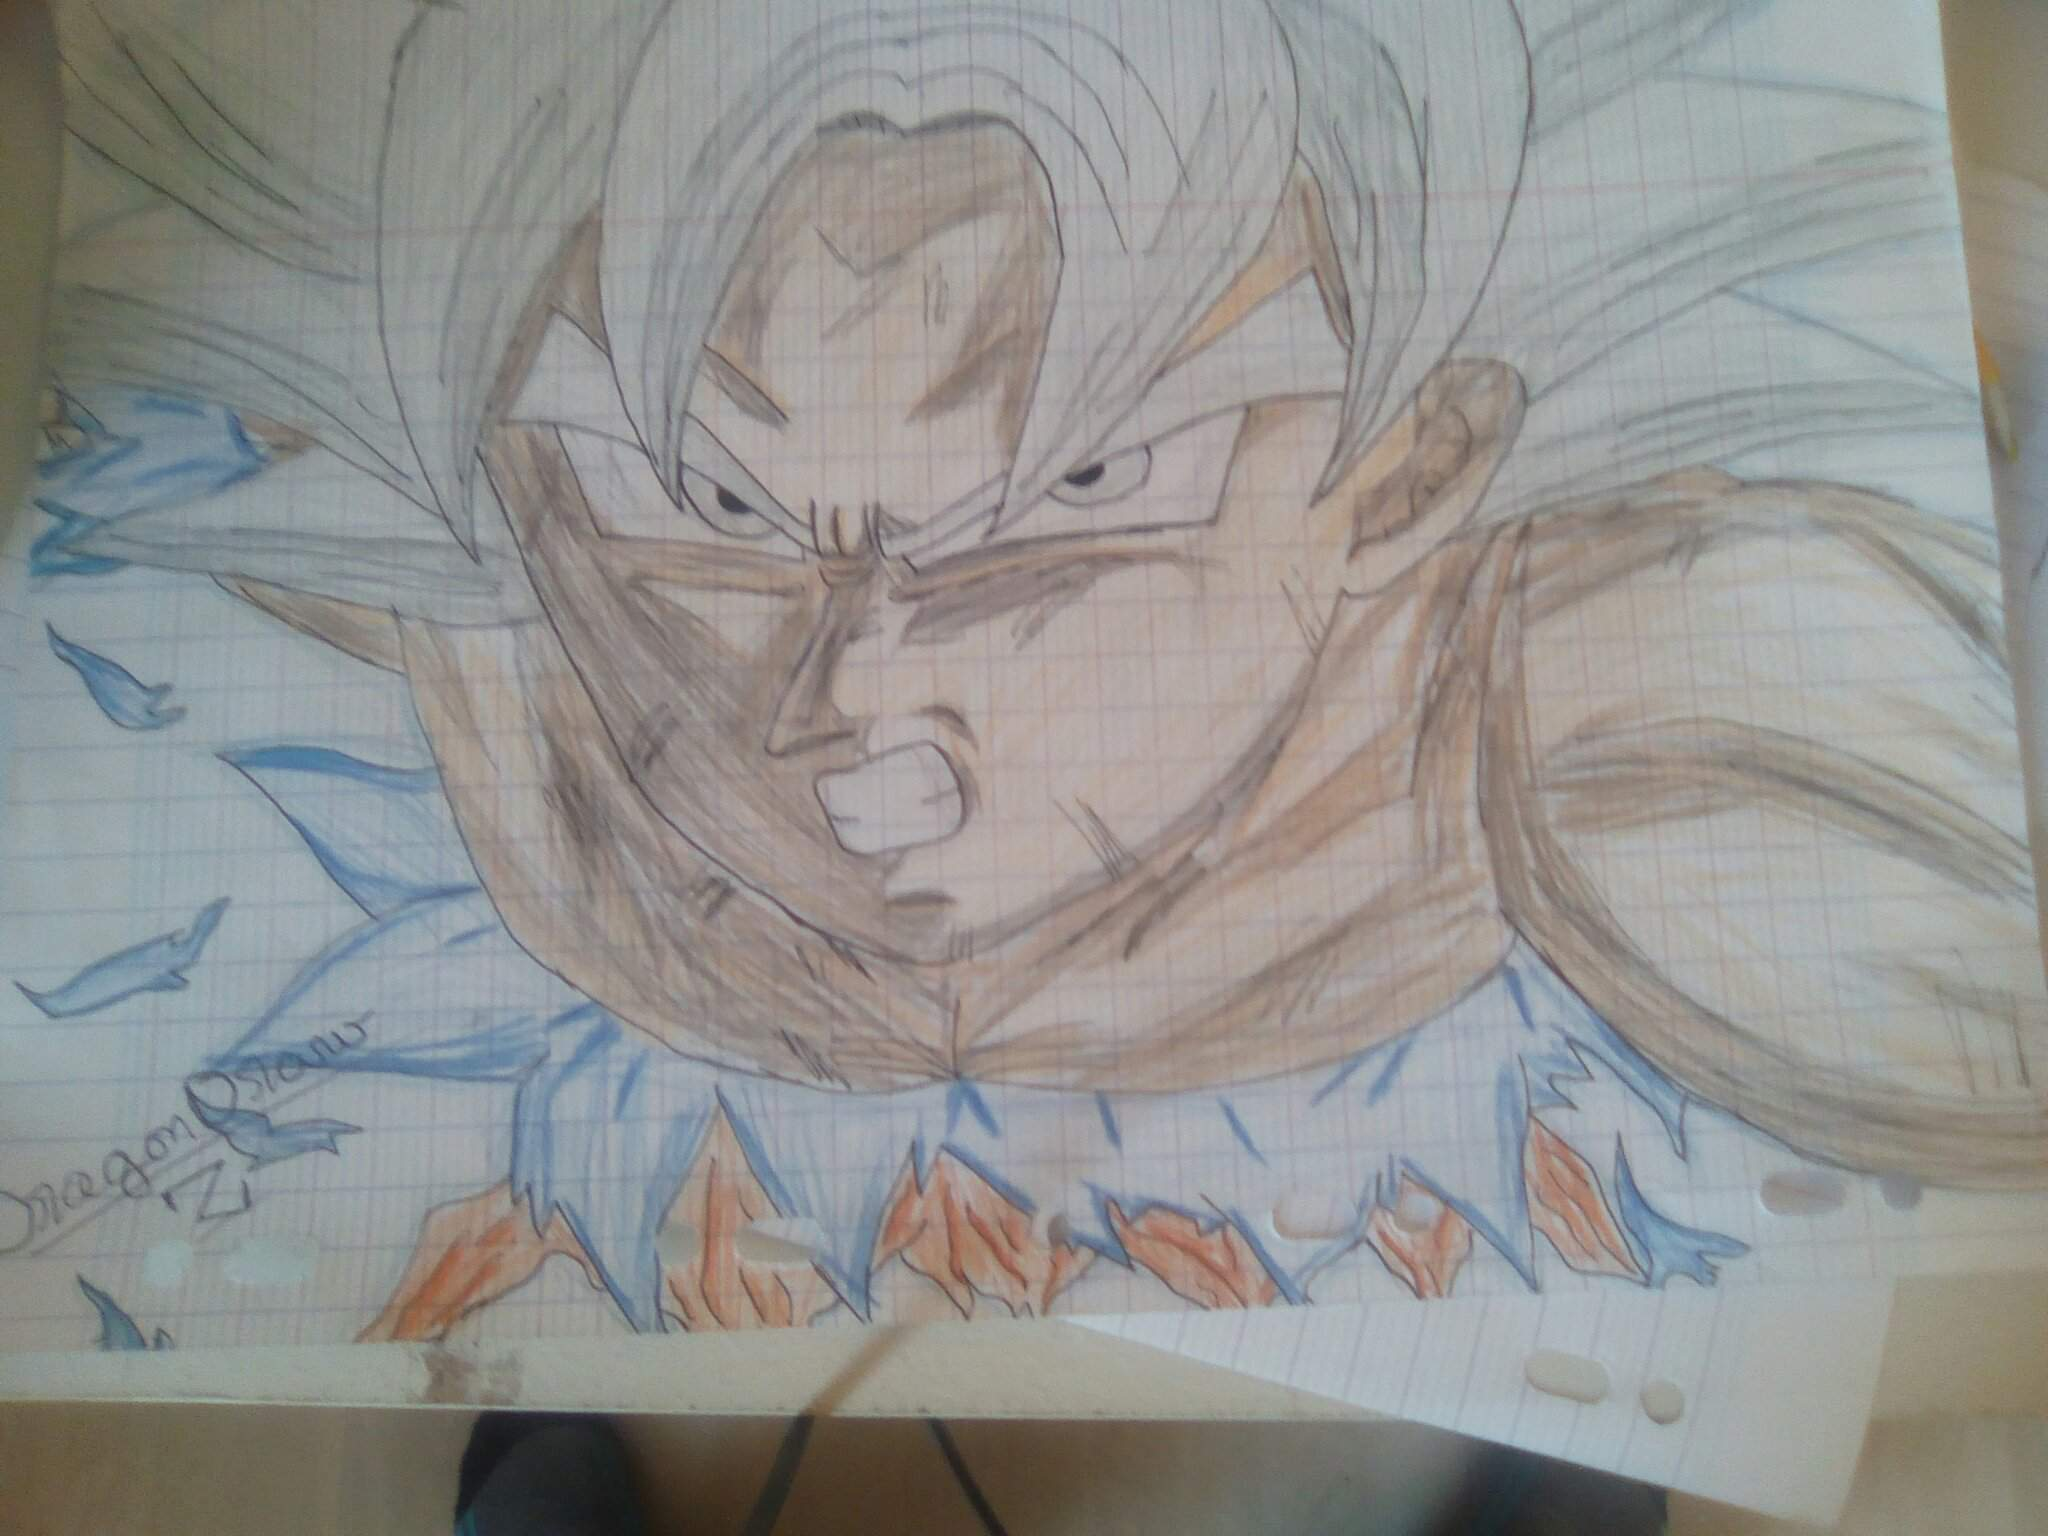 Je Vous Presente Avec Ma Signature Mon Dessin De Goku Ultra Instinct Maitriser Dragon Ball France Amino